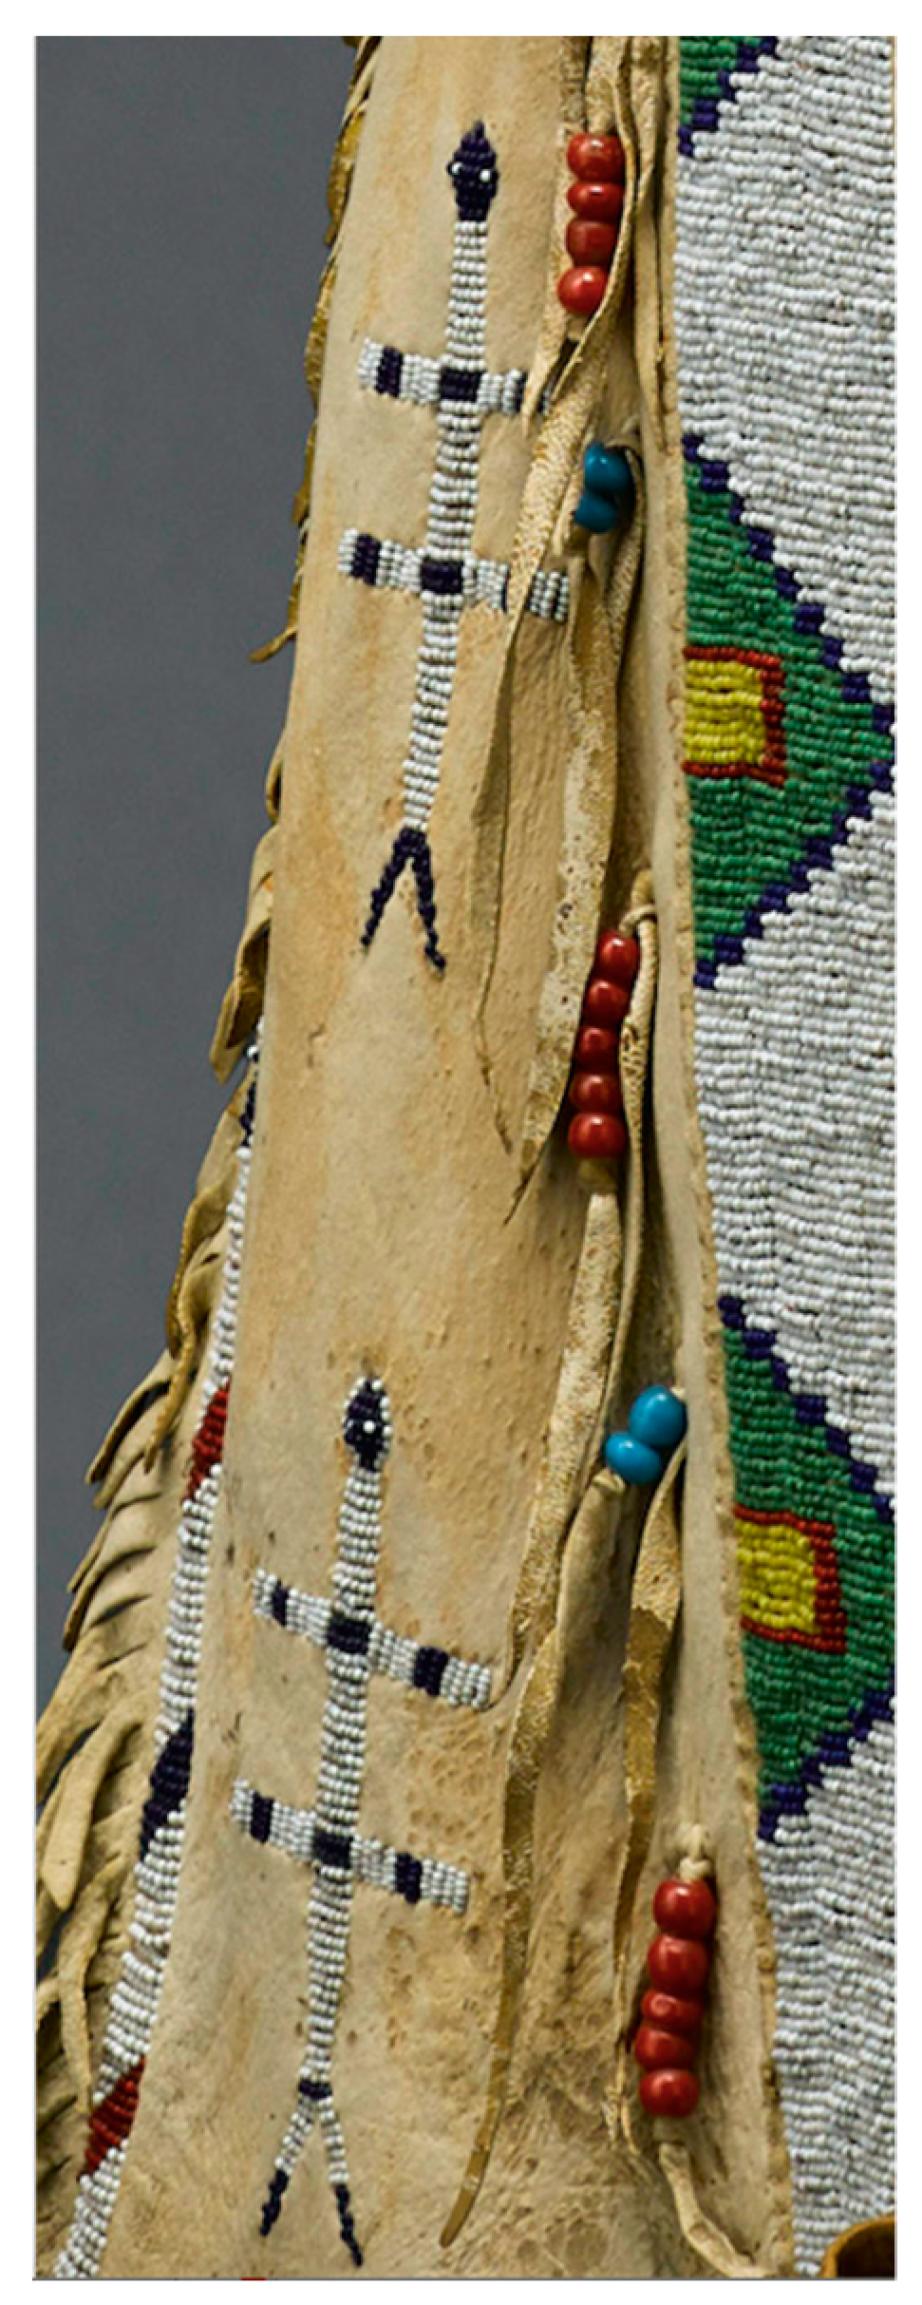 Dressing À L Américaine arts | free full-text | circulating regalia and lakȟóta